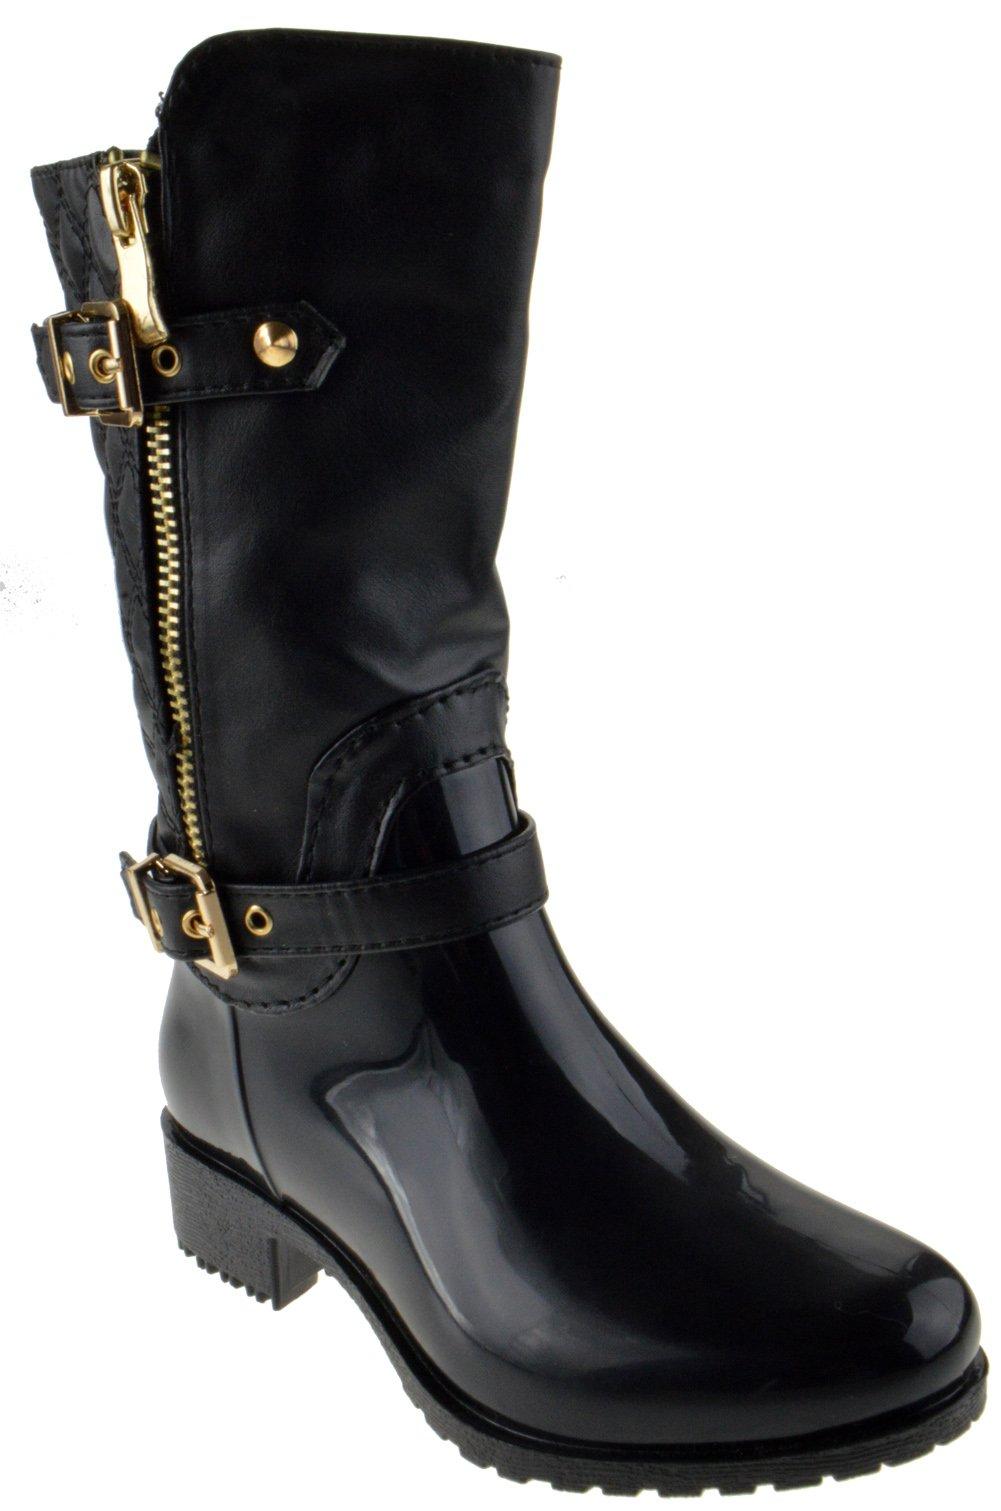 Rainy 6K Little Girls Pvc Riding Waterproof Zipper Boots Black 1